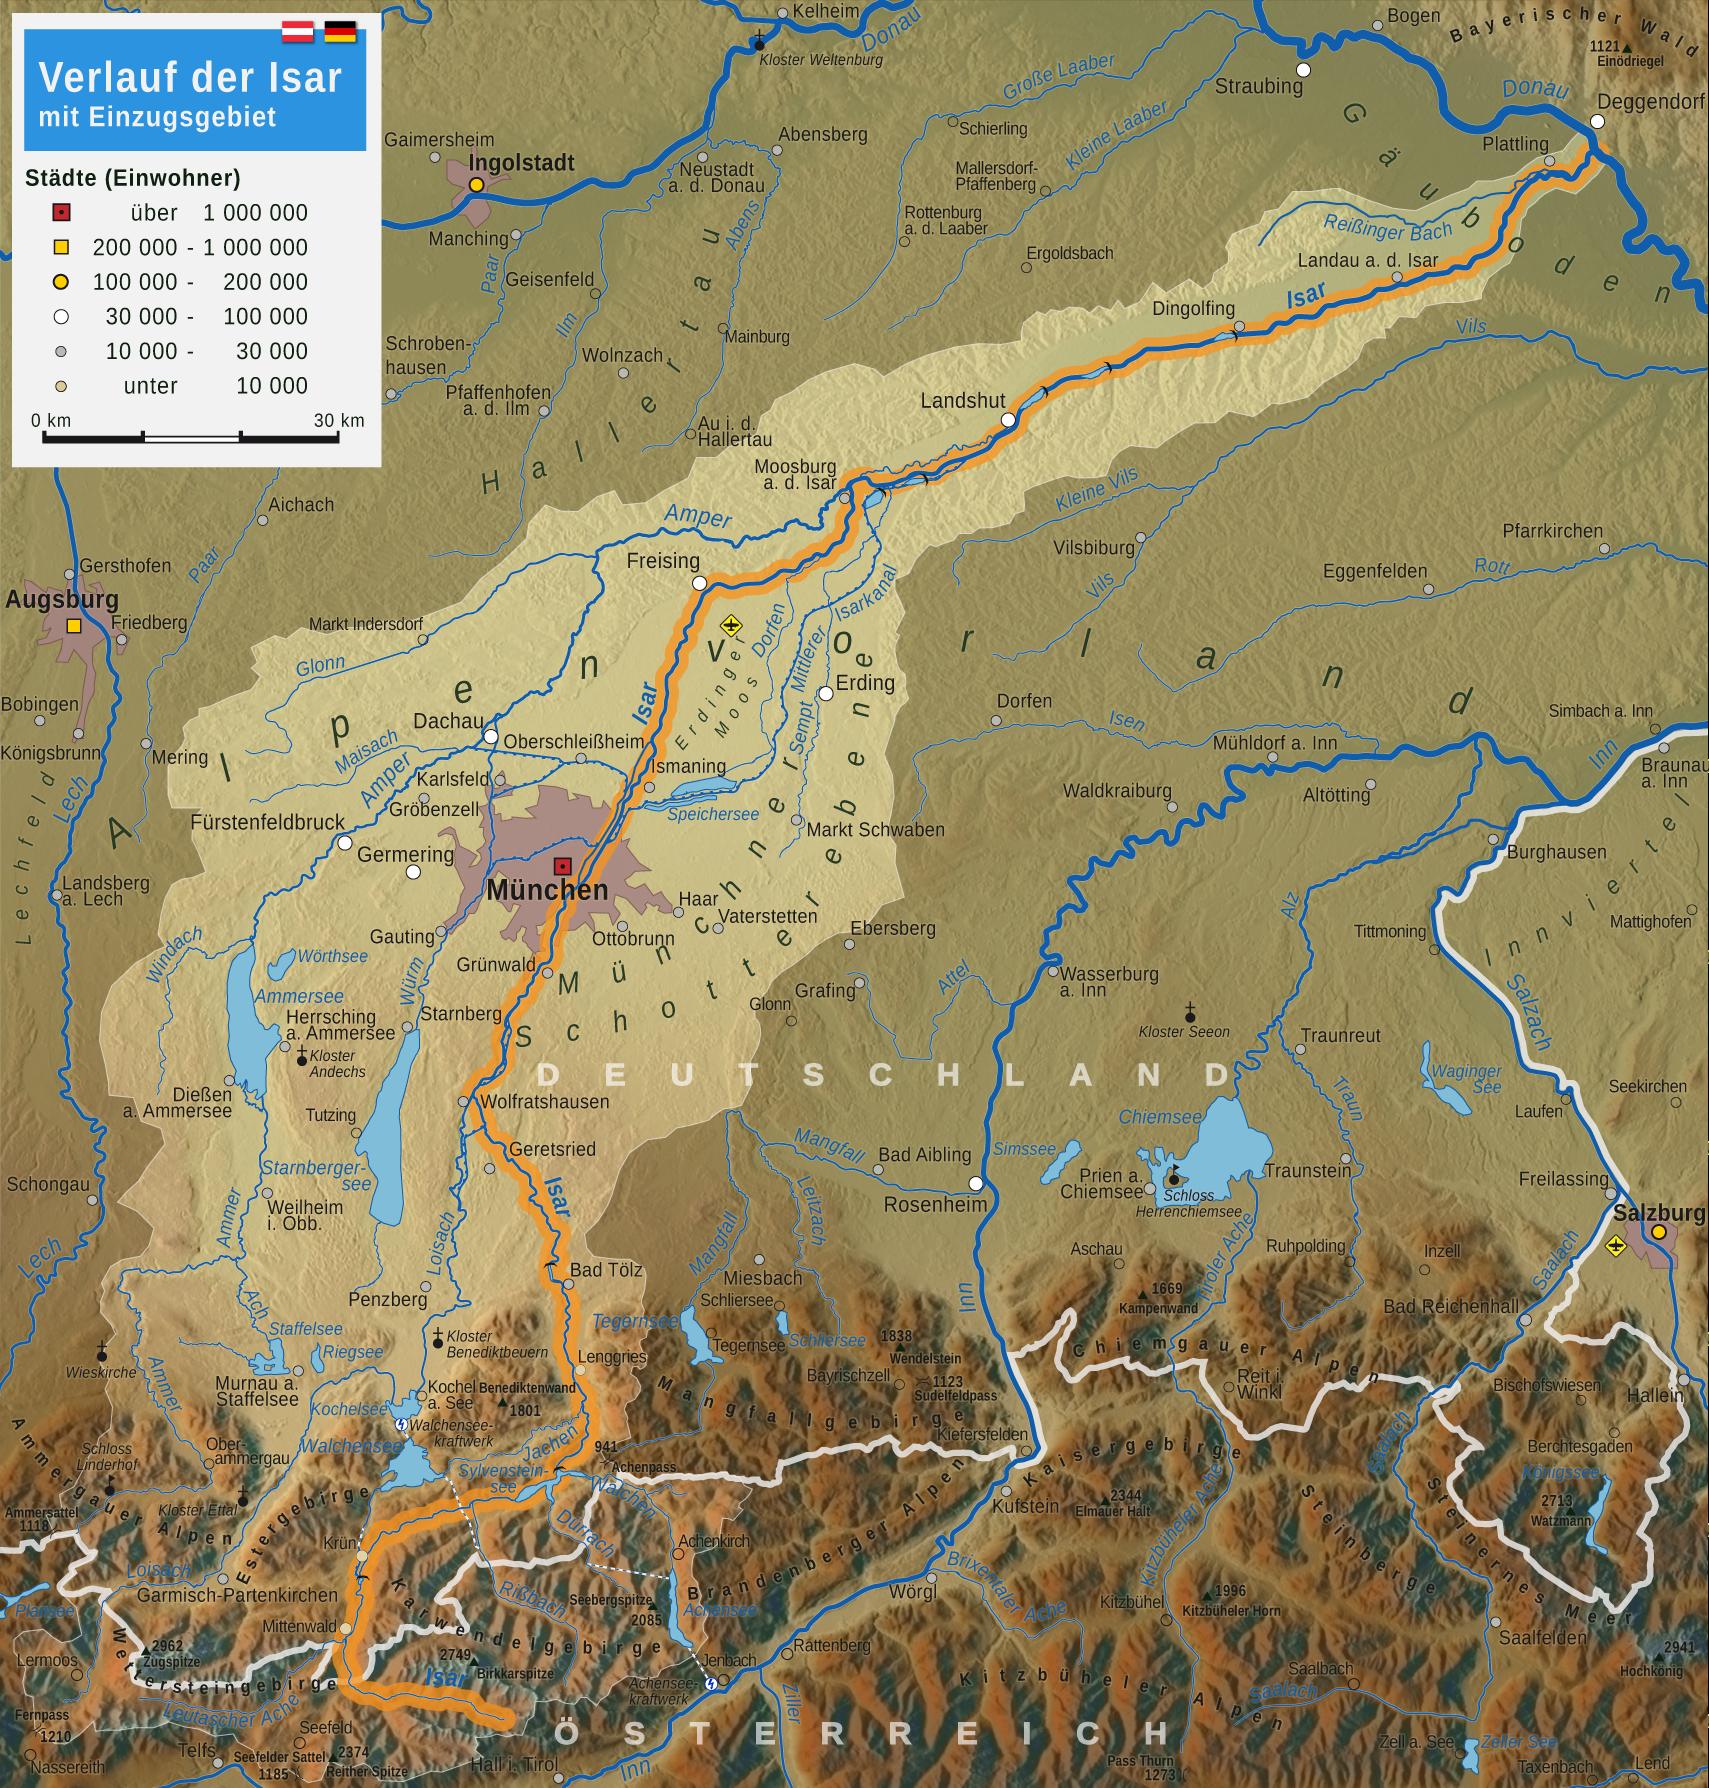 Isar Fluss Karte.Isar Wikipedia